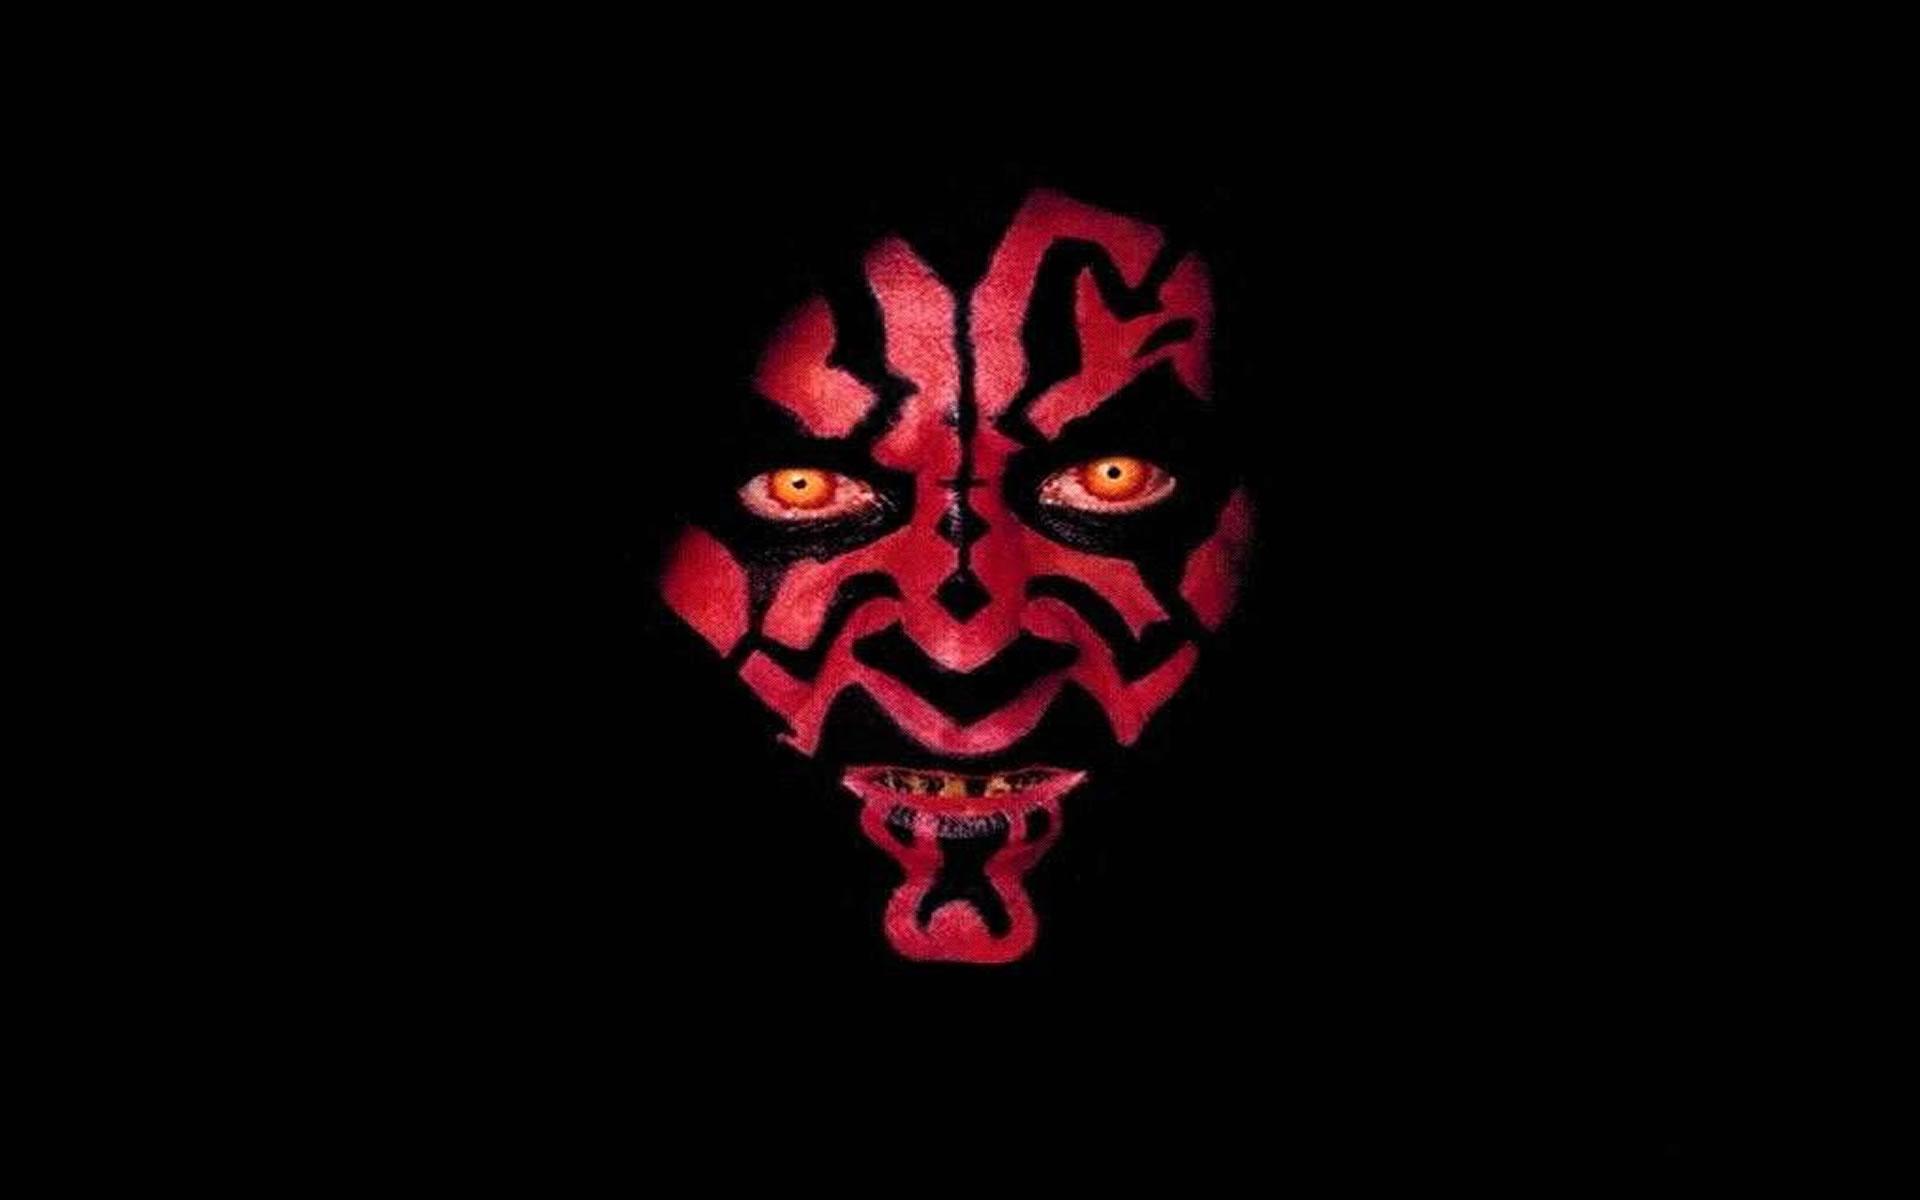 Star Wars Wallpaper. Lord Sith